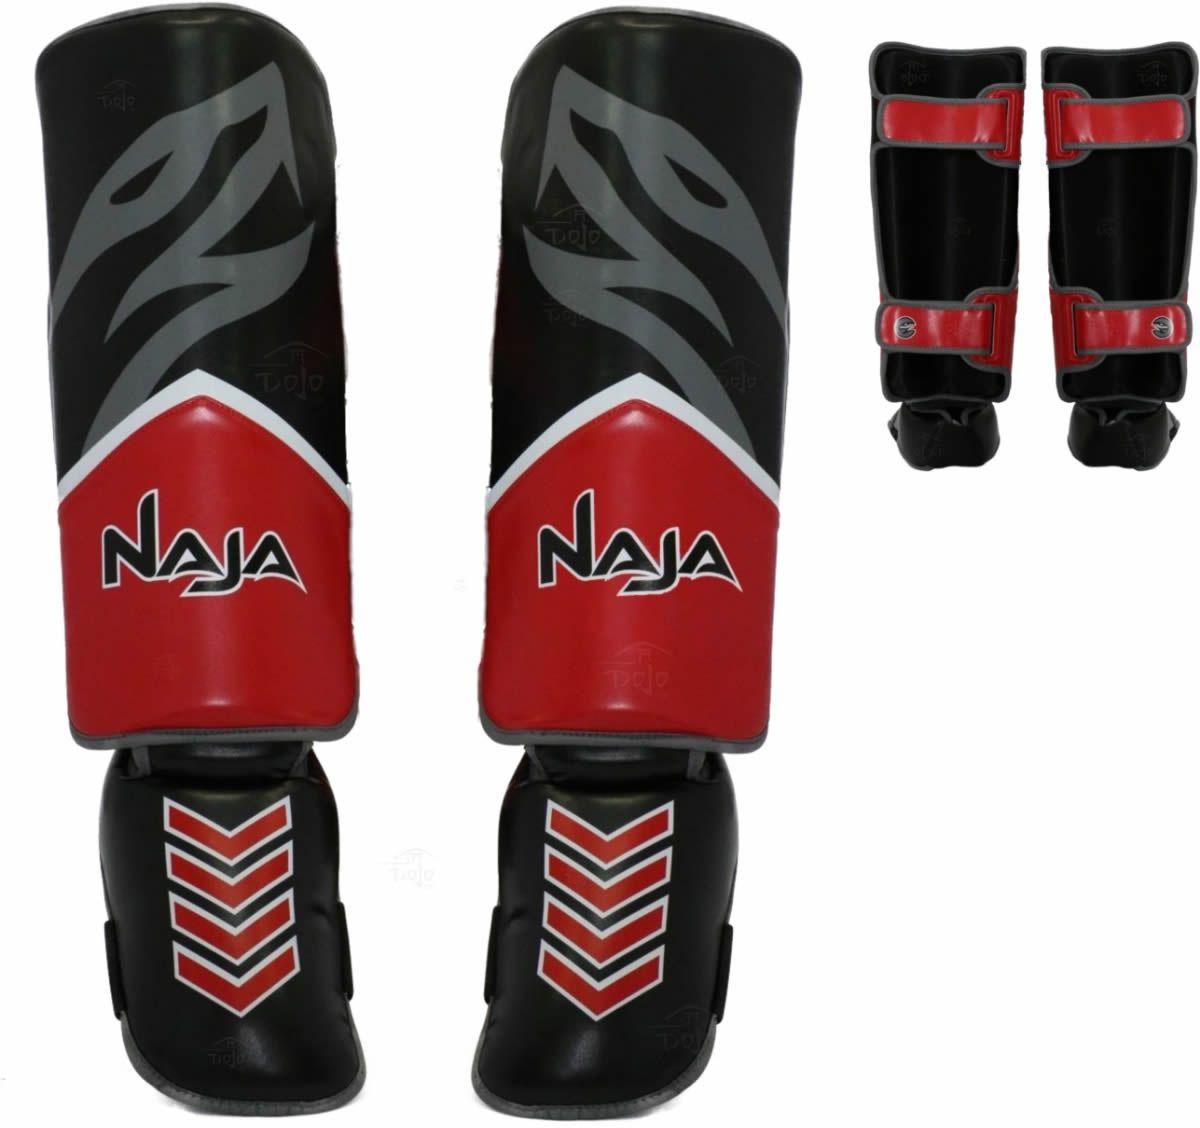 Caneleiras Kick Boxing/Muay Thai - Profissional - Naja New Extreme  - Loja do Competidor